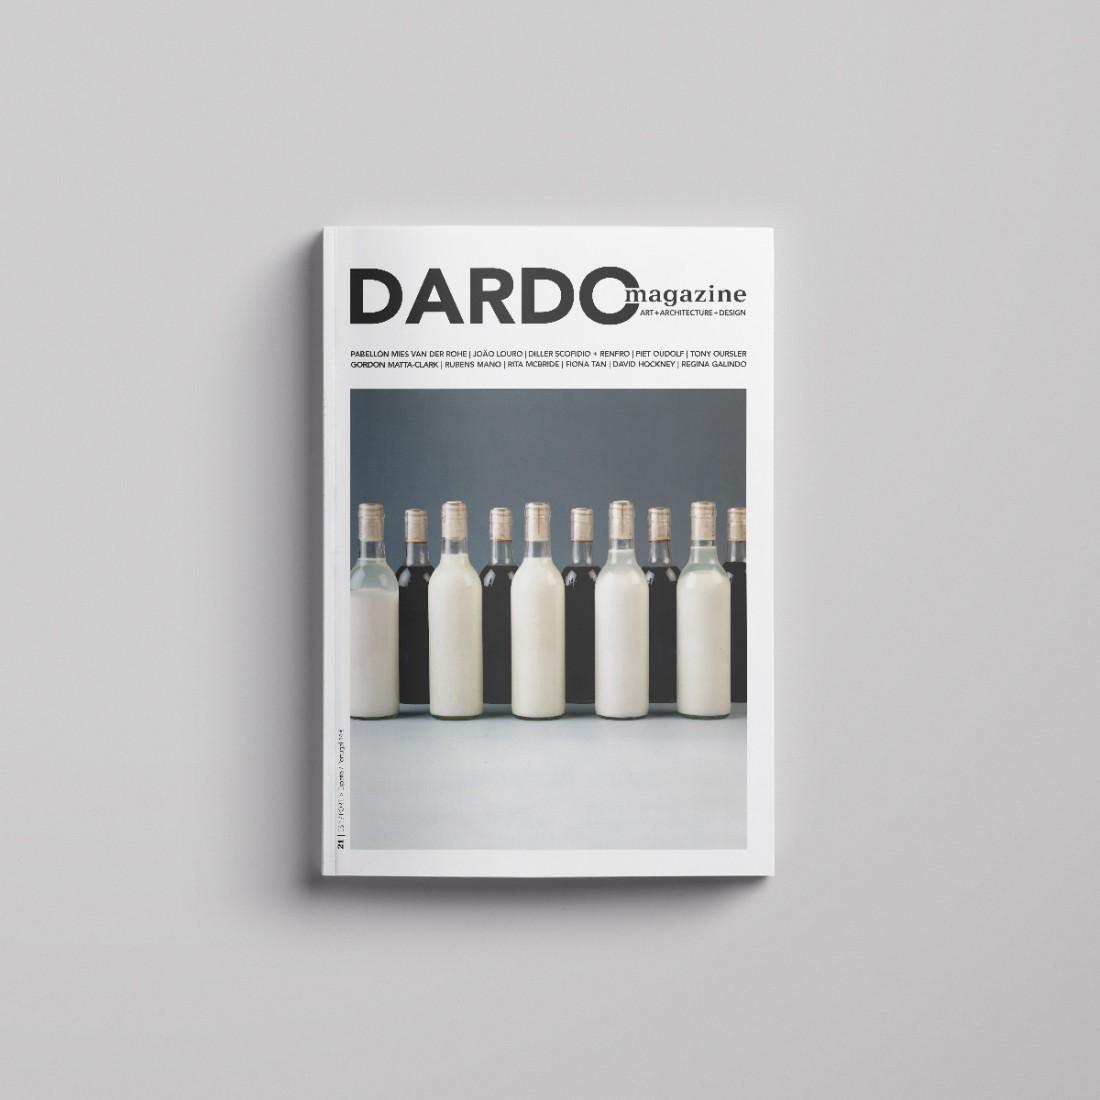 DARDOmagazine 21